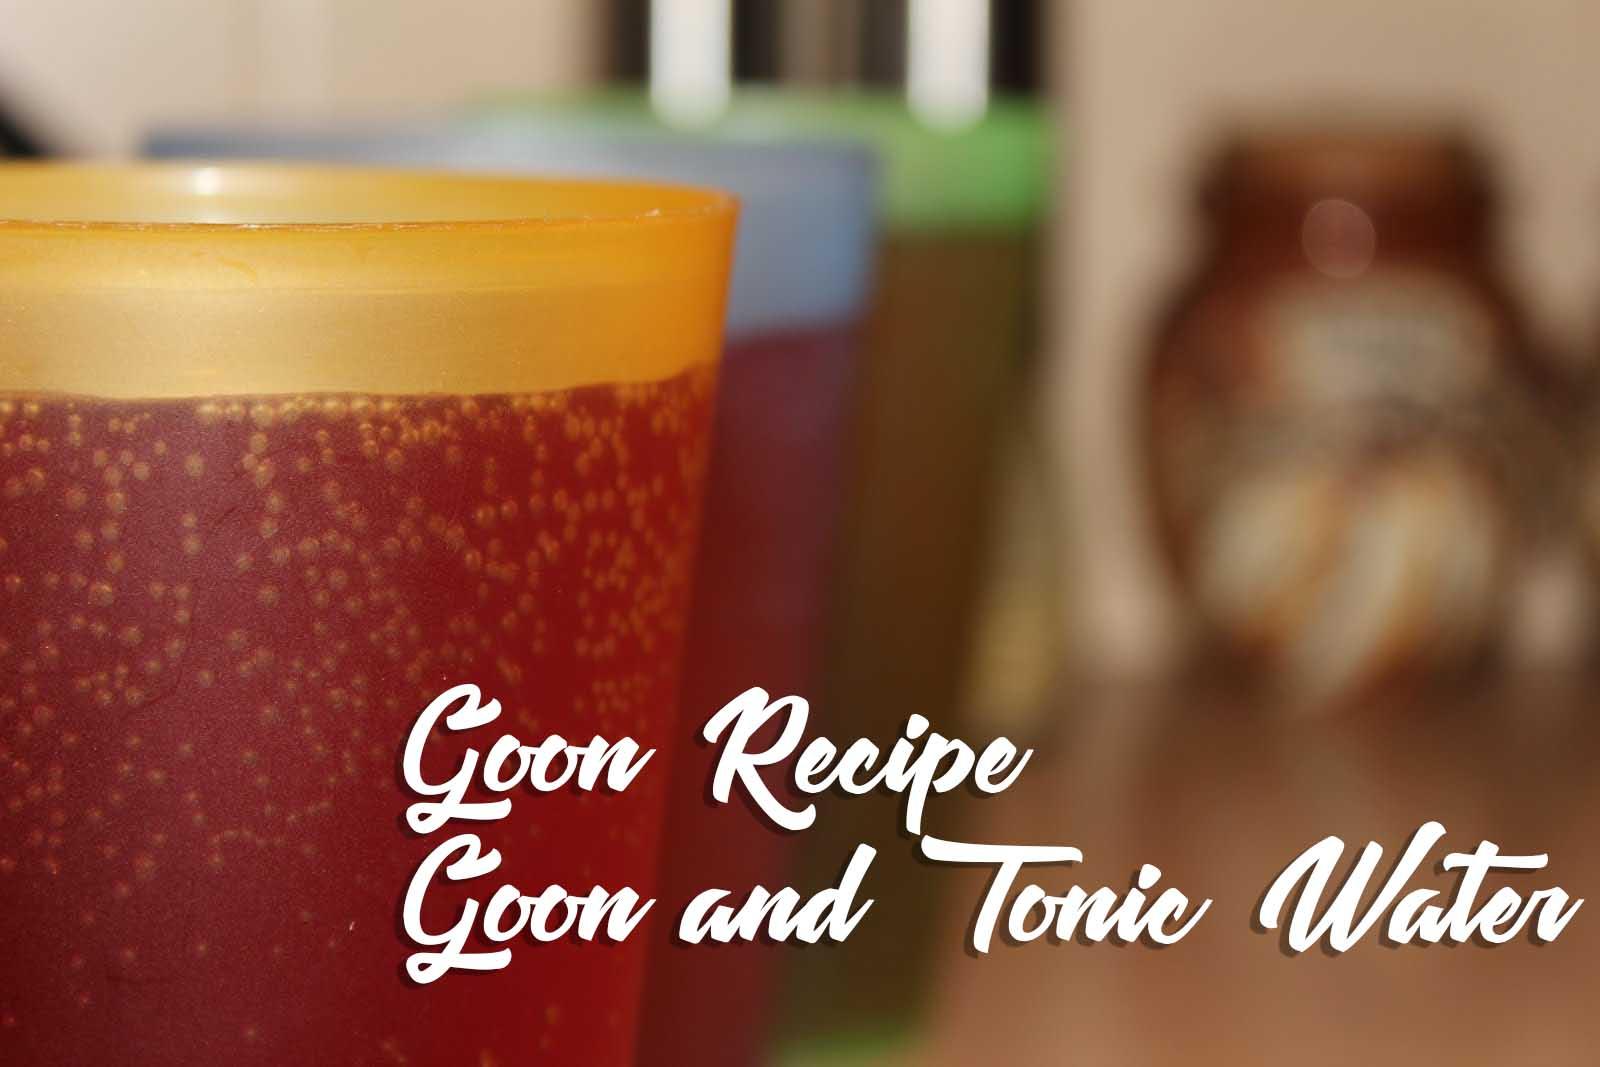 Goon_(Box_Wine)_and_Tonic_Water_Goon_Recipe